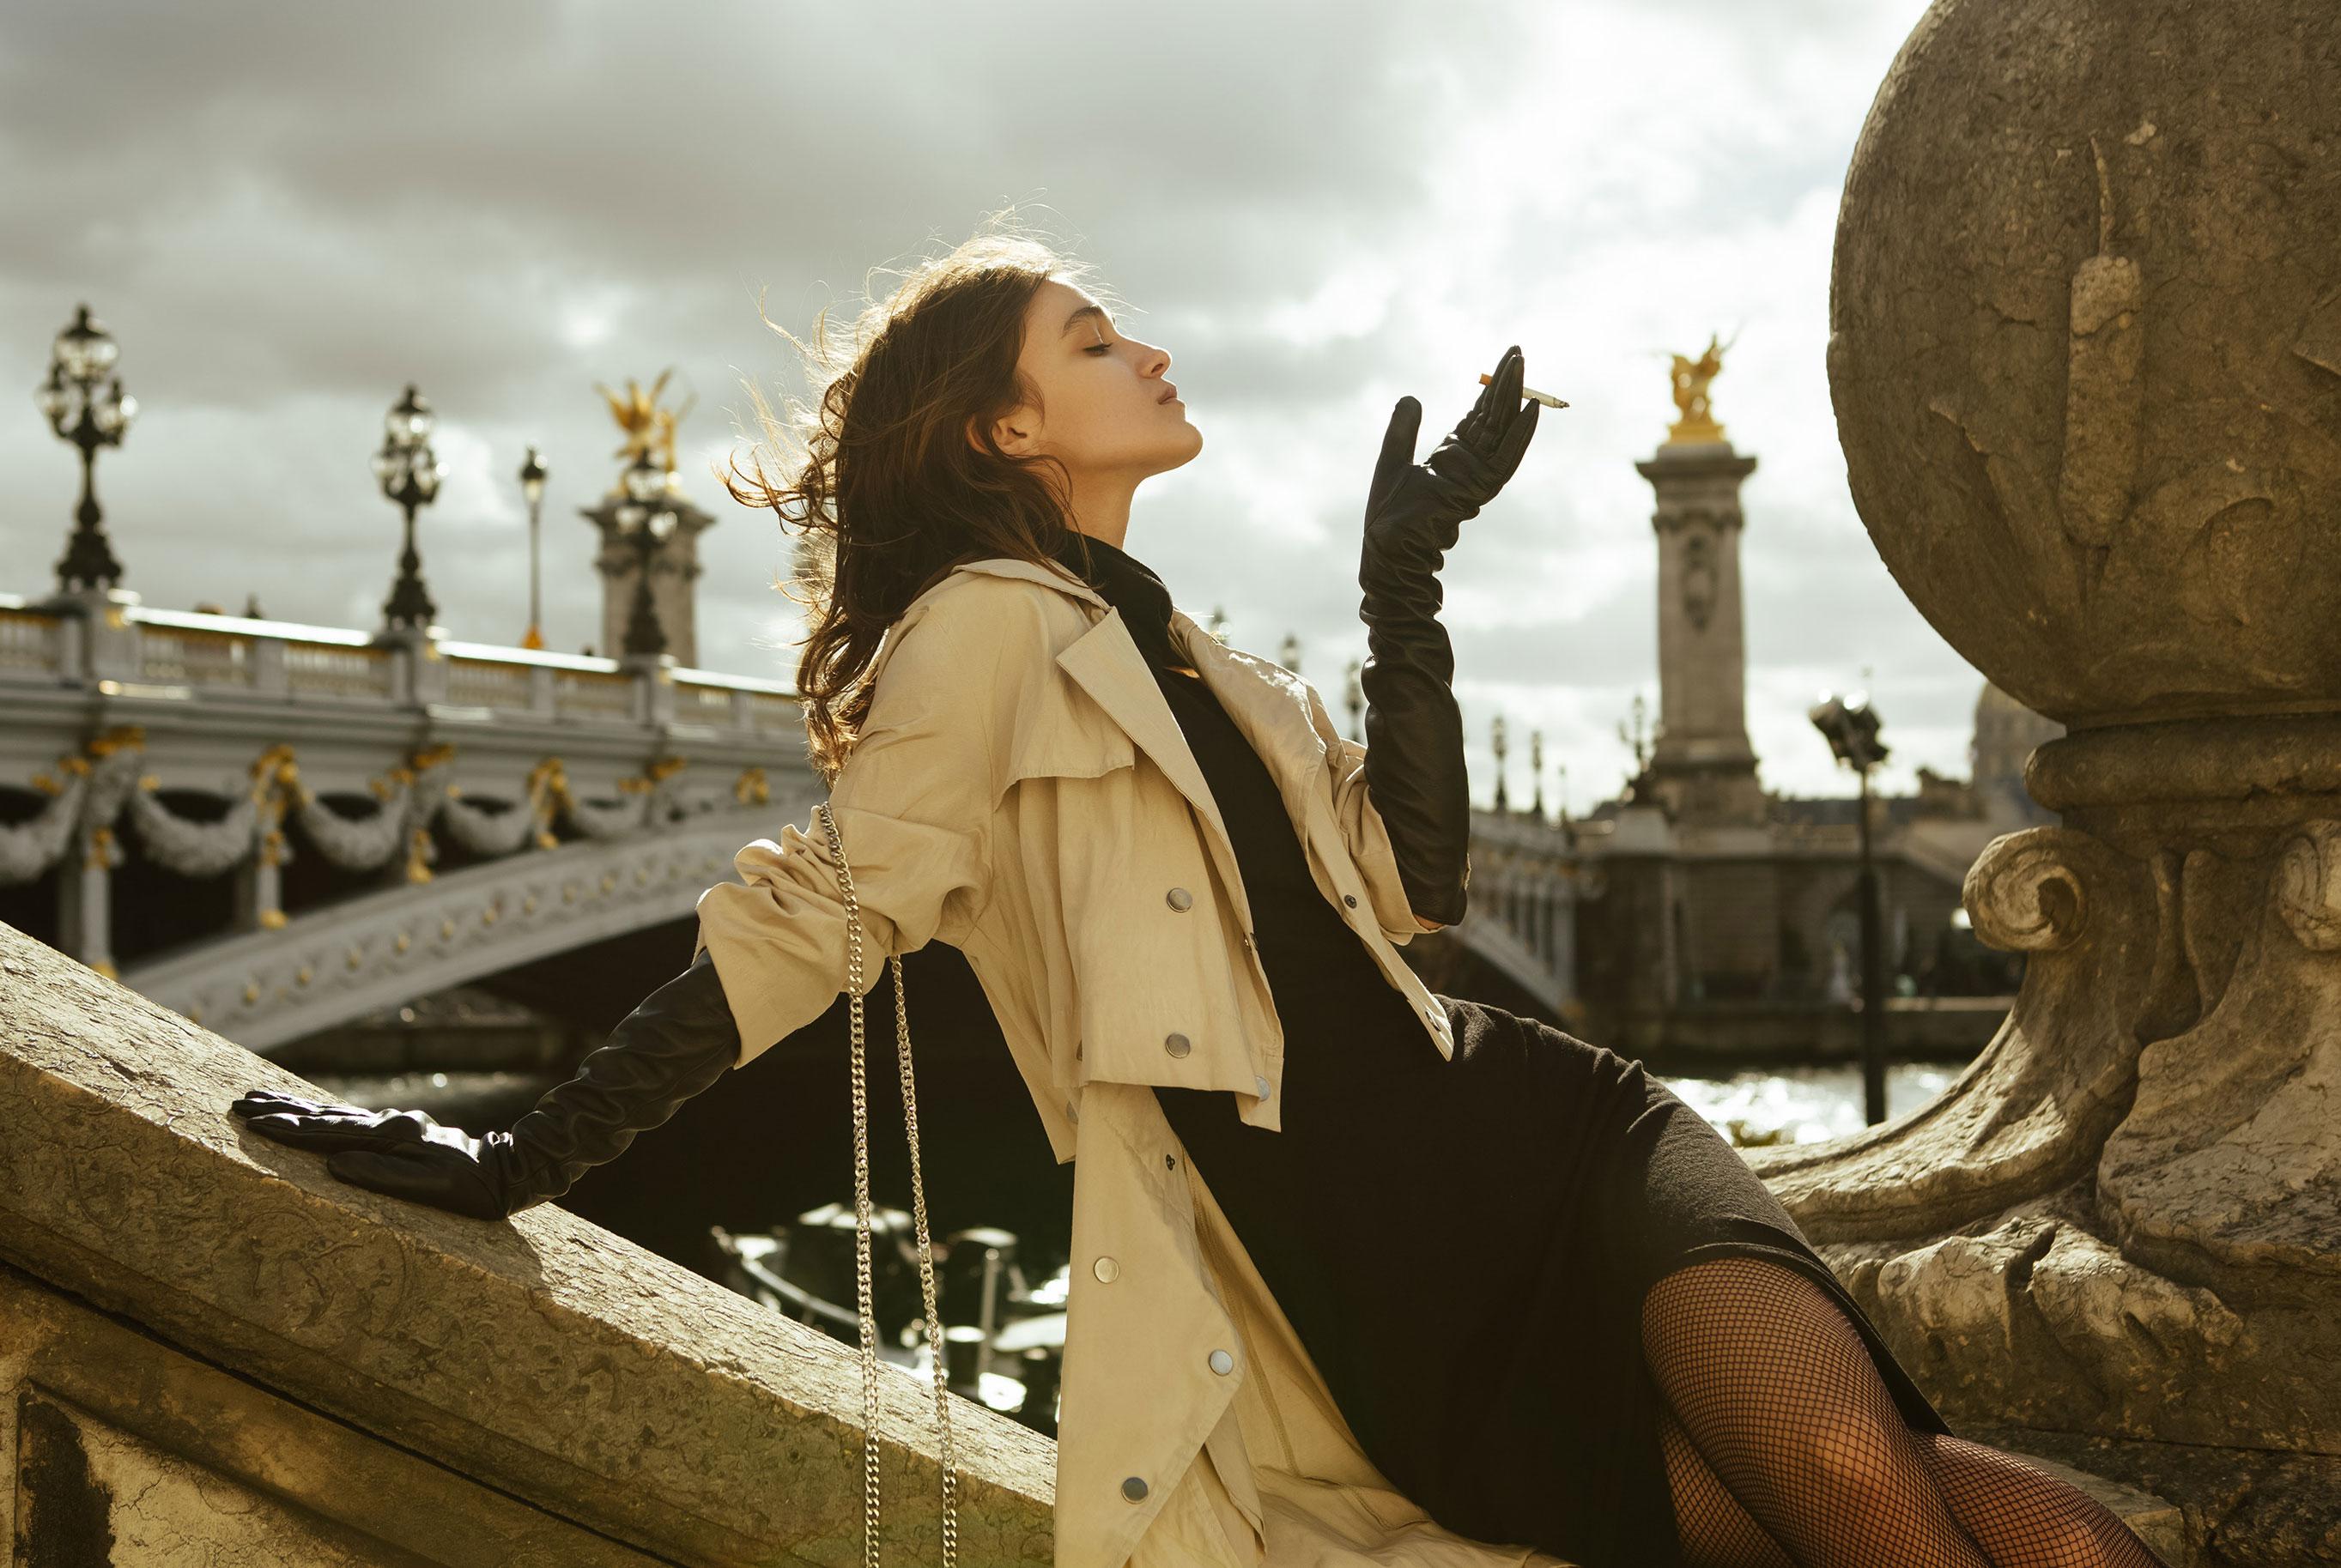 модная Паула гуляет по Парижу / фото 01